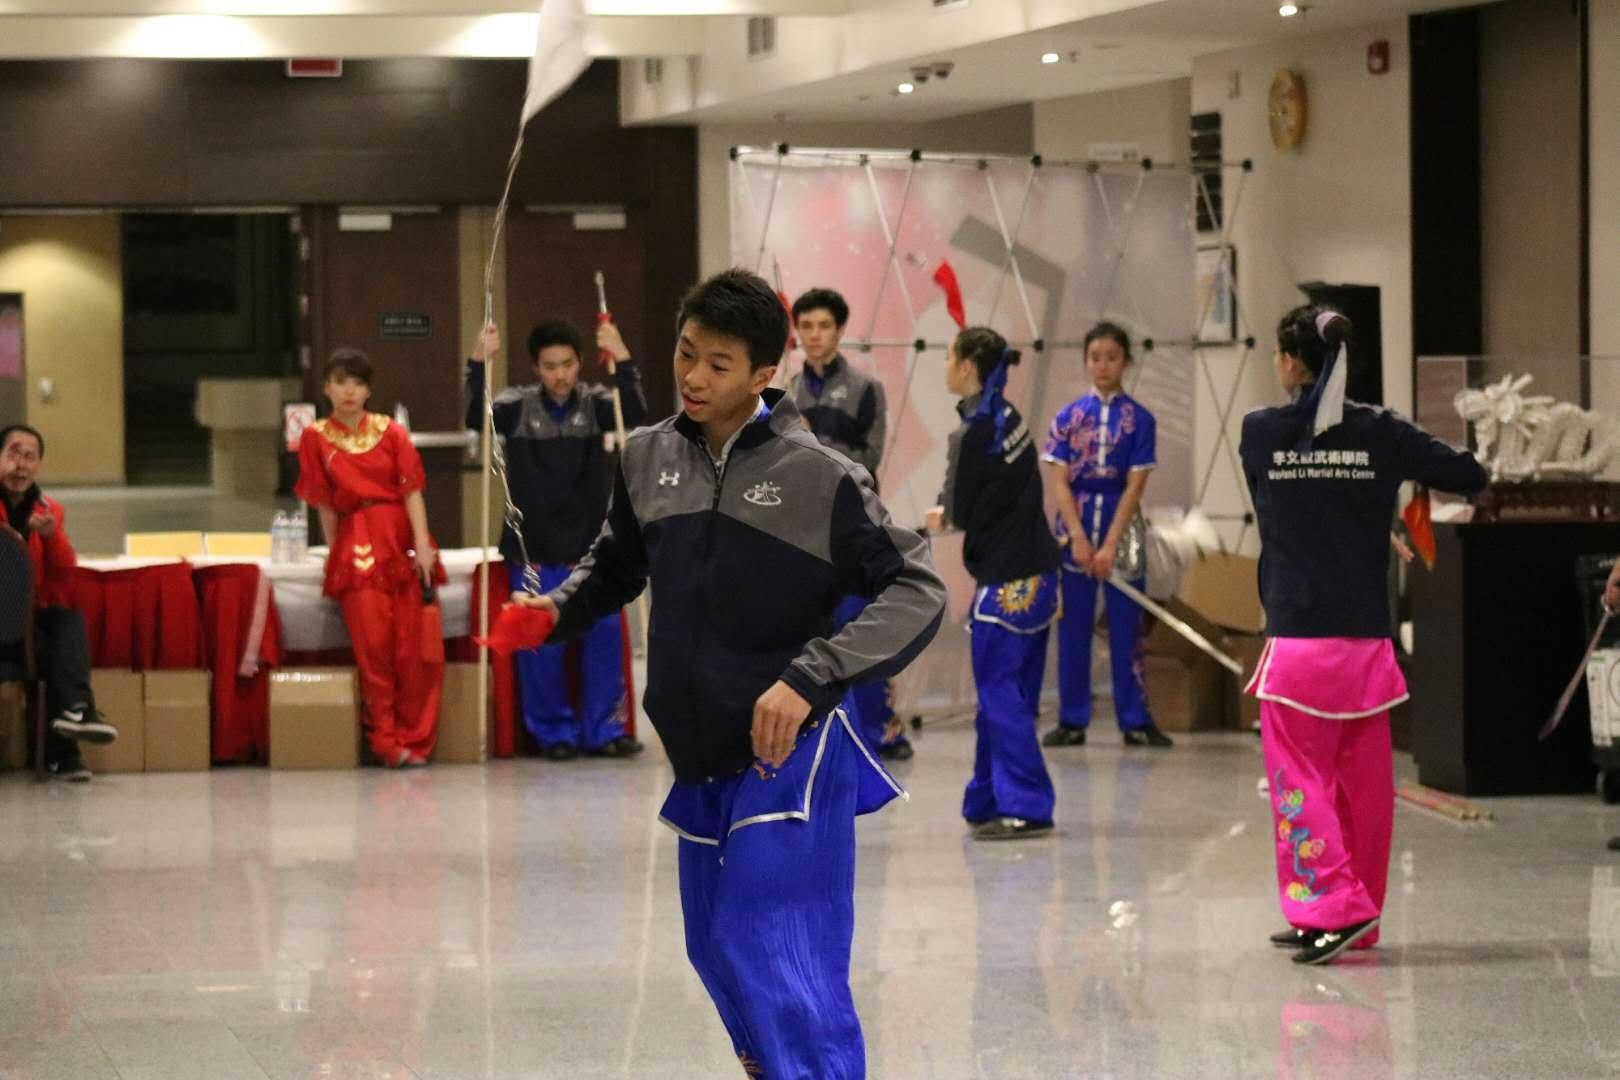 wayland-li-wushu-fairchild-toronto-spring-festival-gala-2018-10.jpg